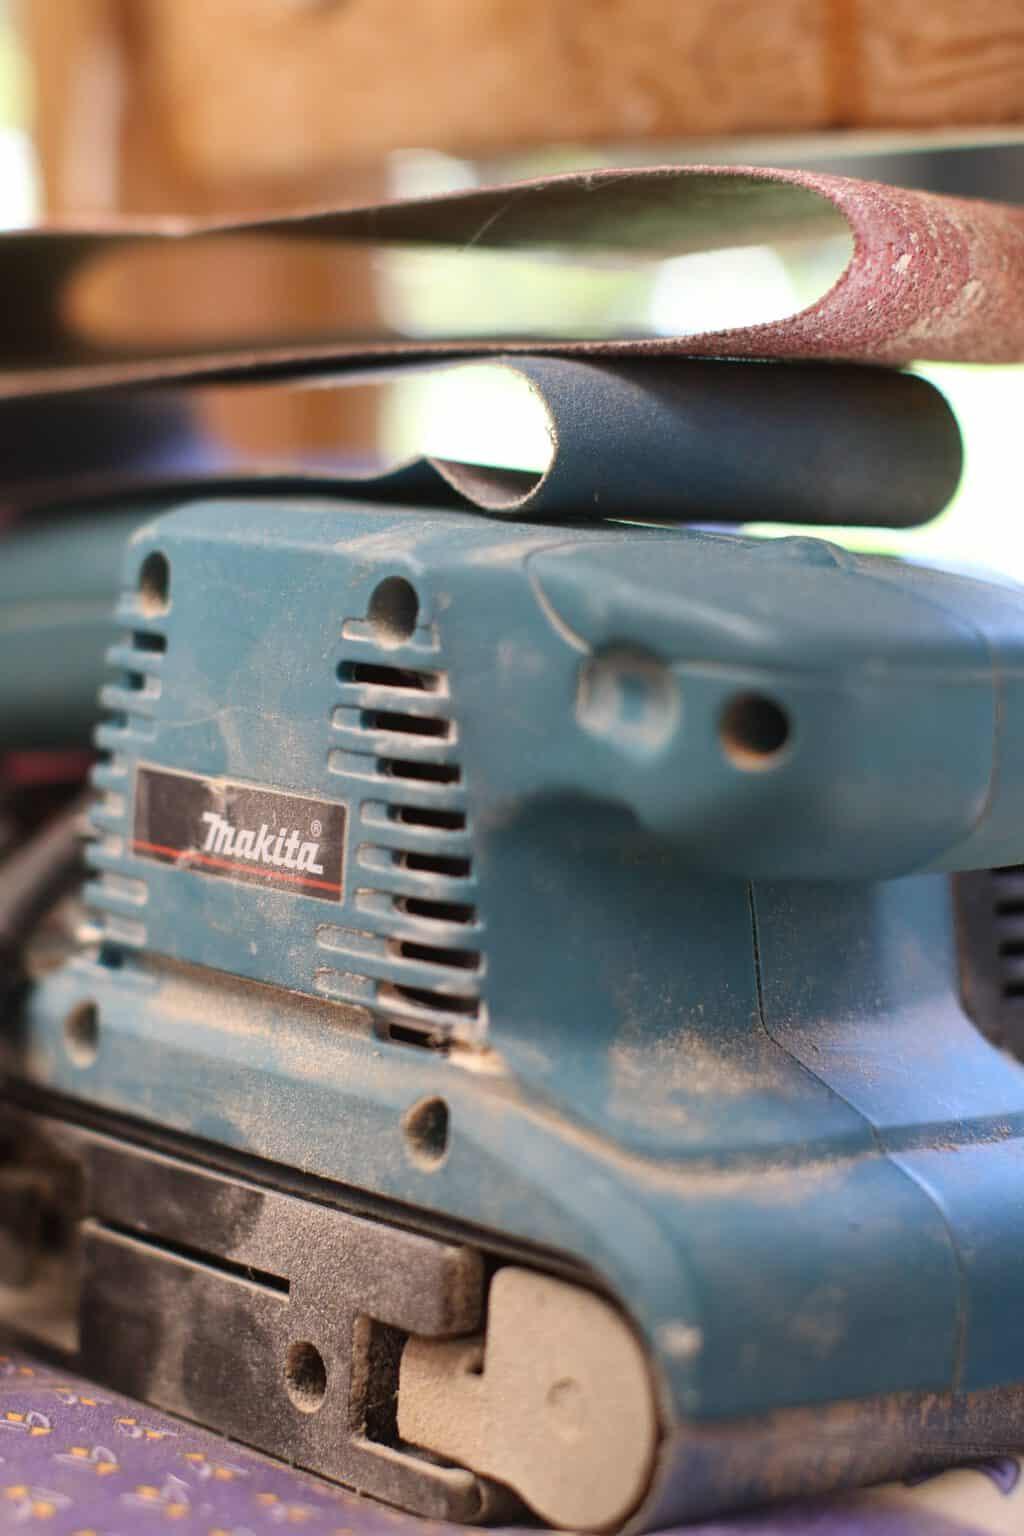 Close up of a blue makita sander